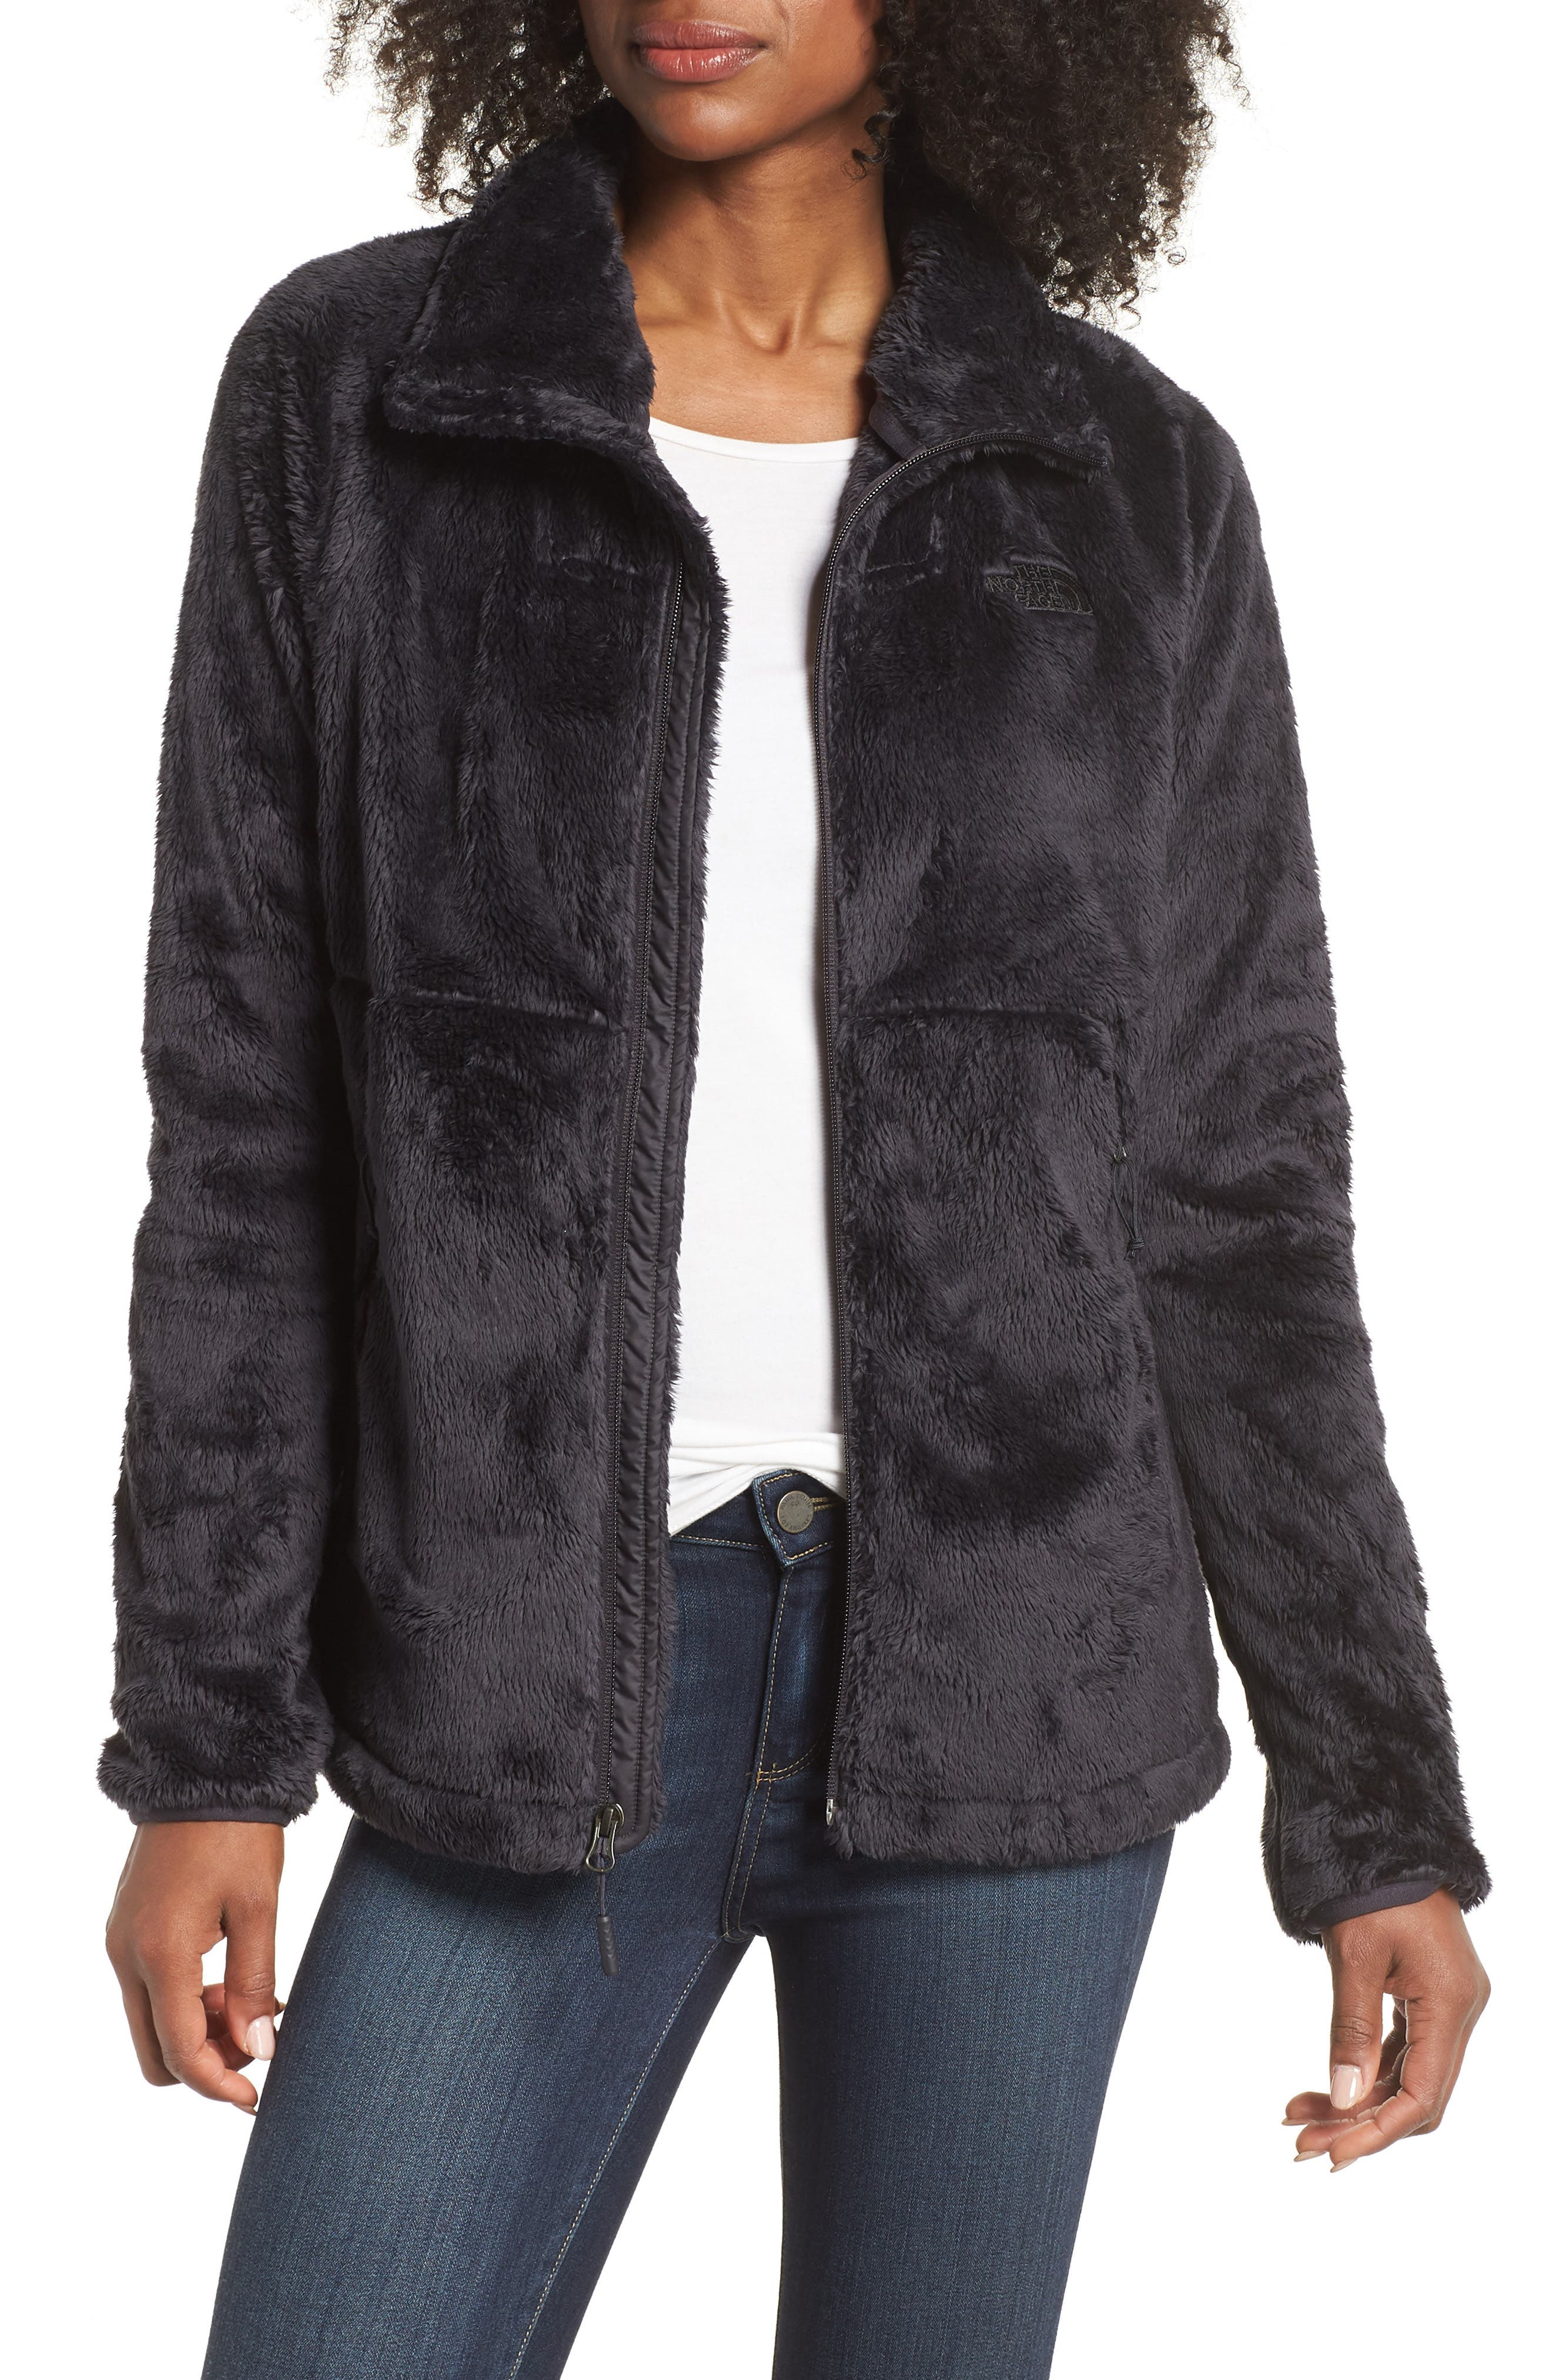 Osito Sport Hybrid Jacket,                             Main thumbnail 1, color,                             WEATHERED BLACK